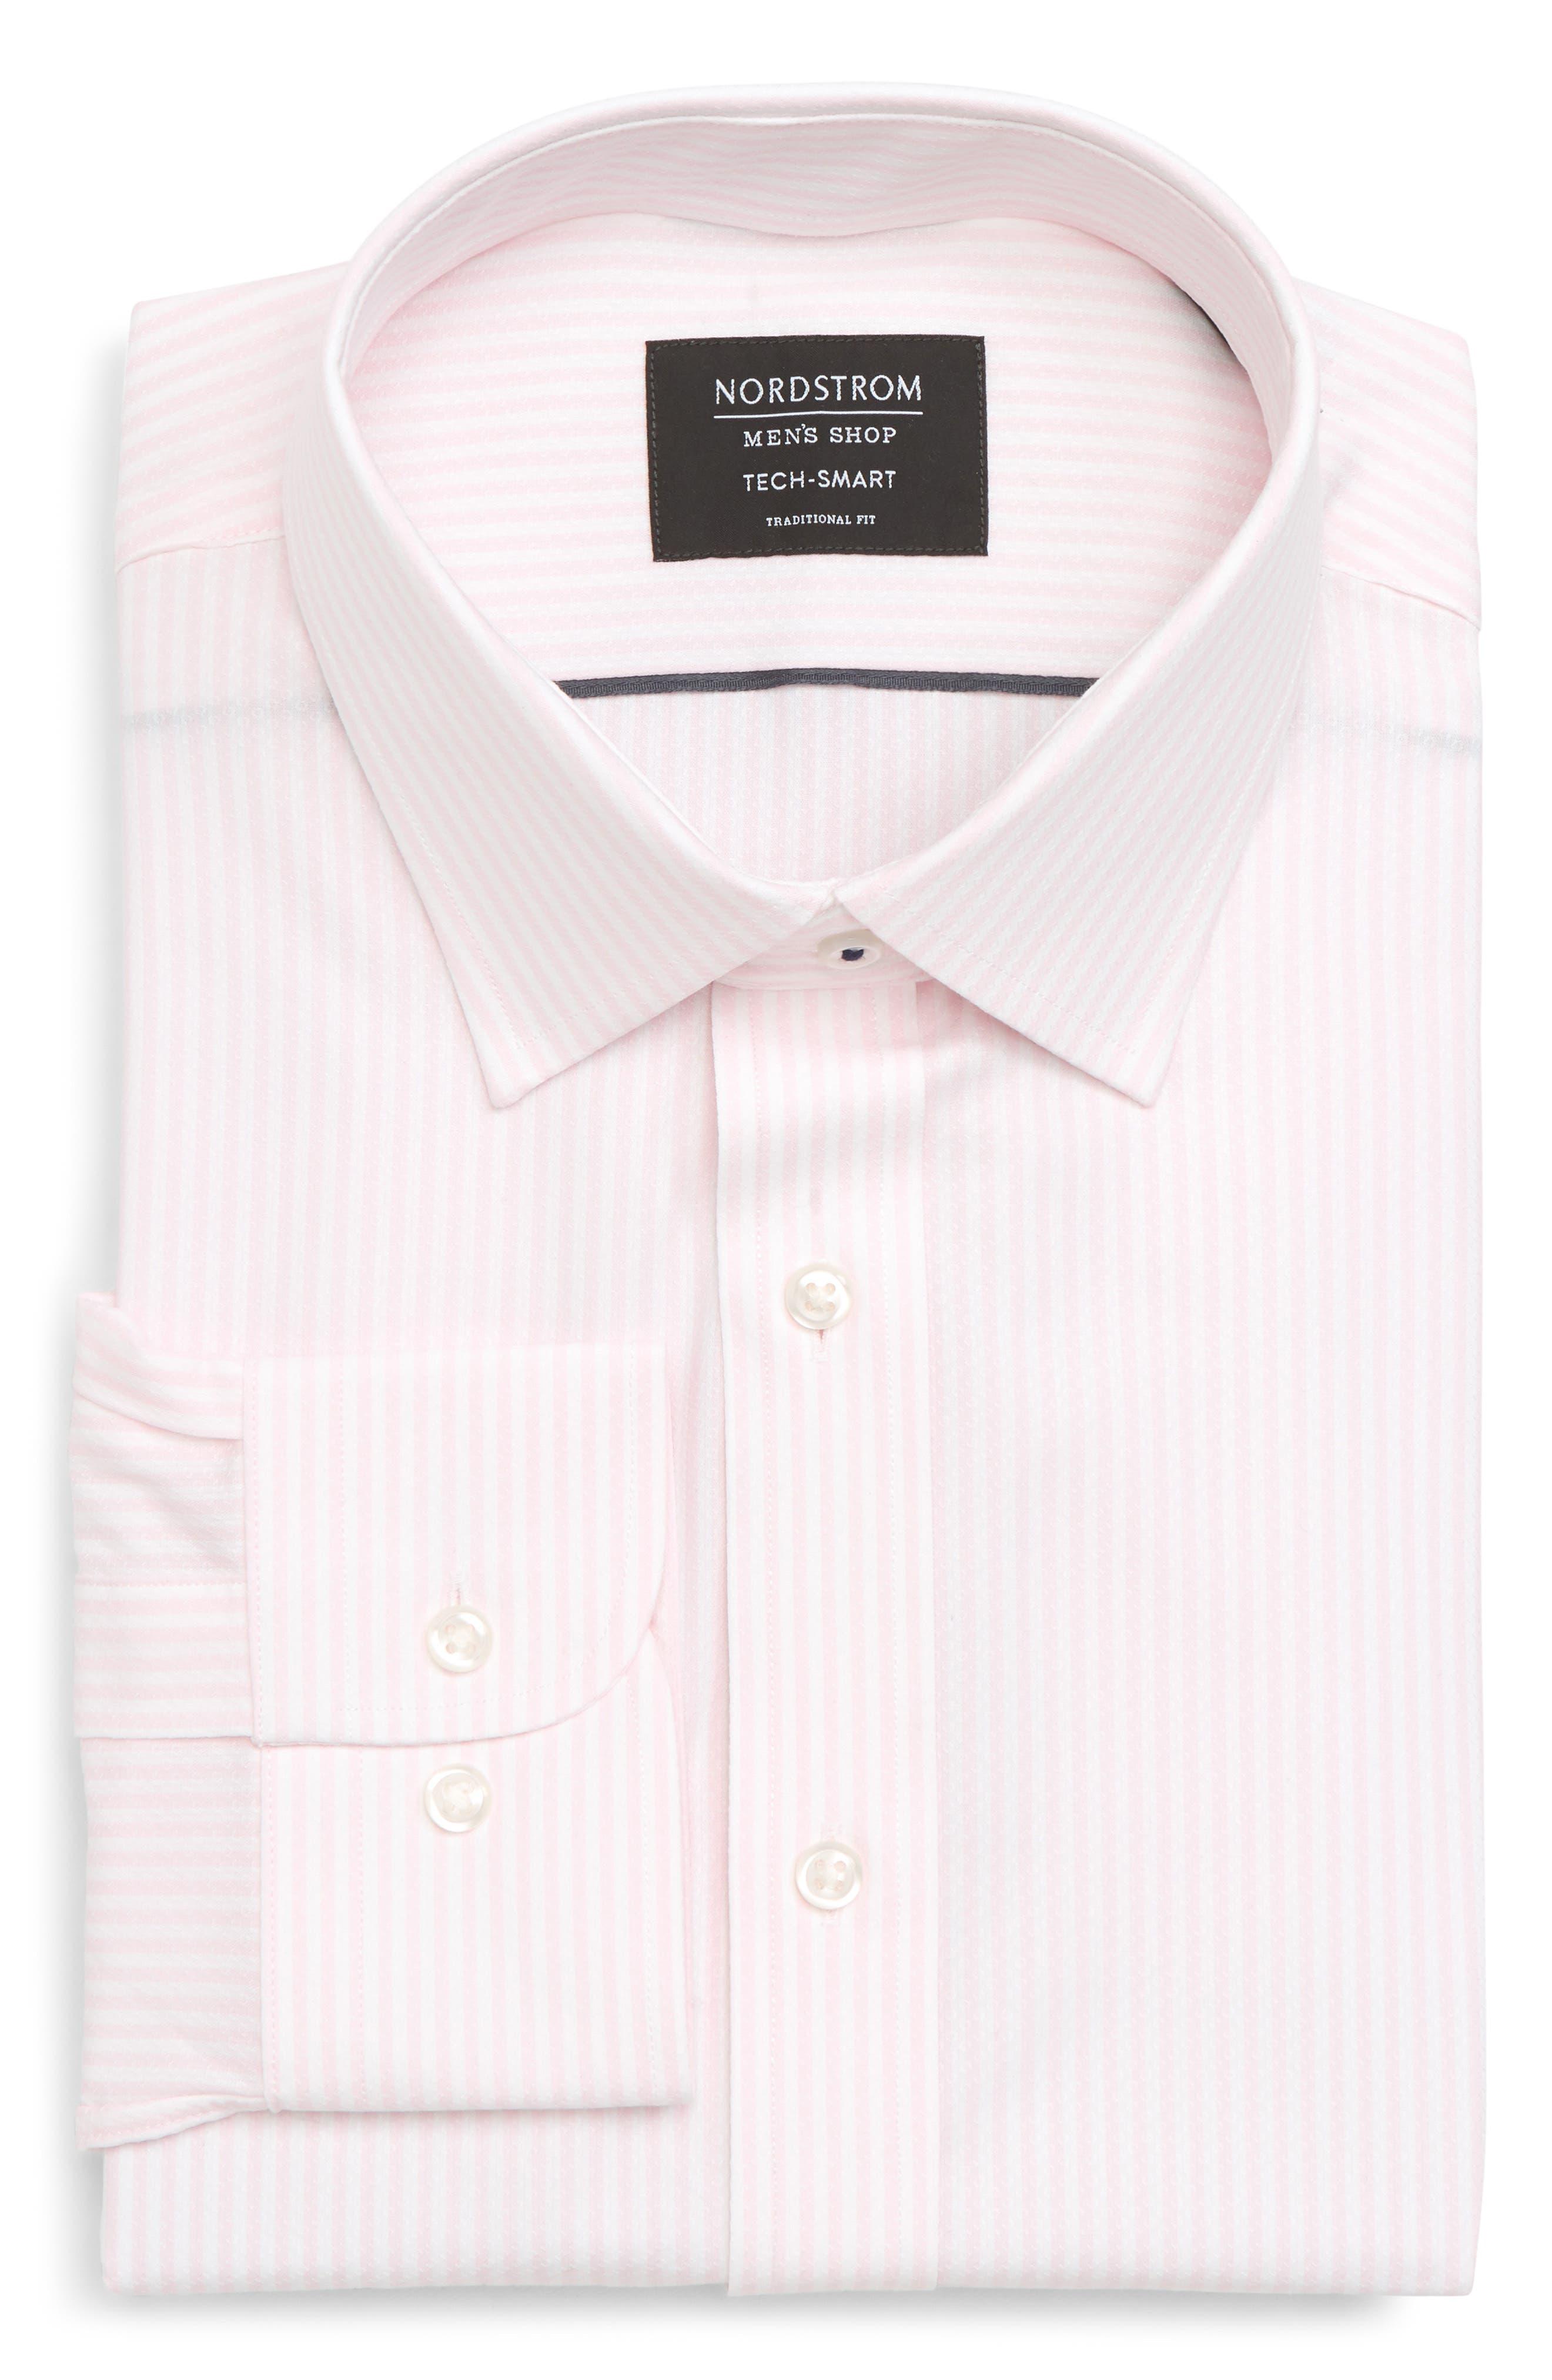 Nordstrom Men's Shop Tech-Smart Traditional Fit Stripe Stretch Dress Shirt